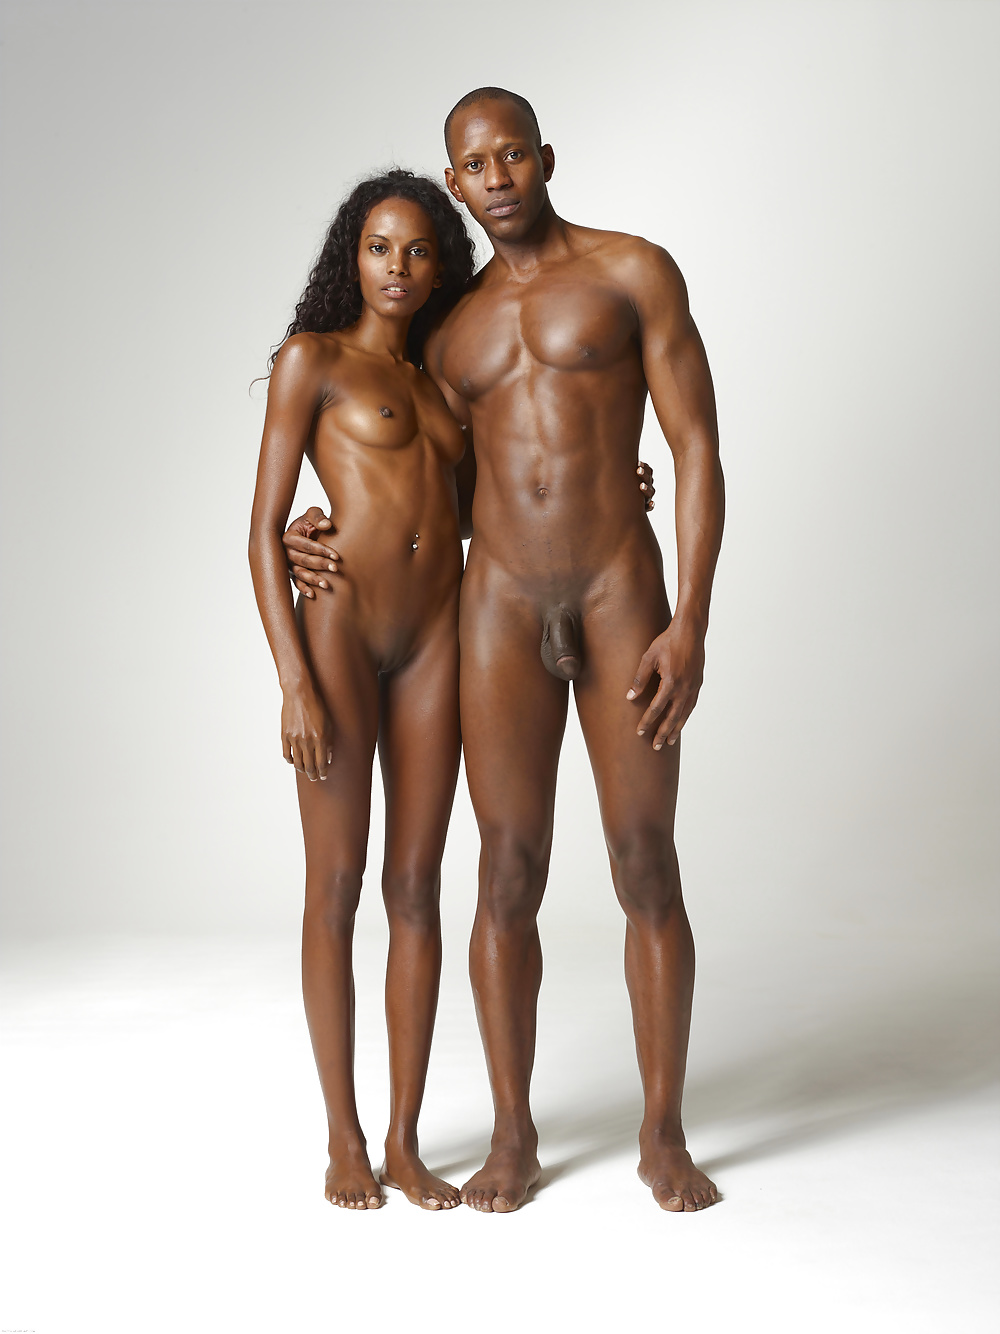 Adria Arjona Nude Leaked Pics, Porn Photo And Sex Scenes